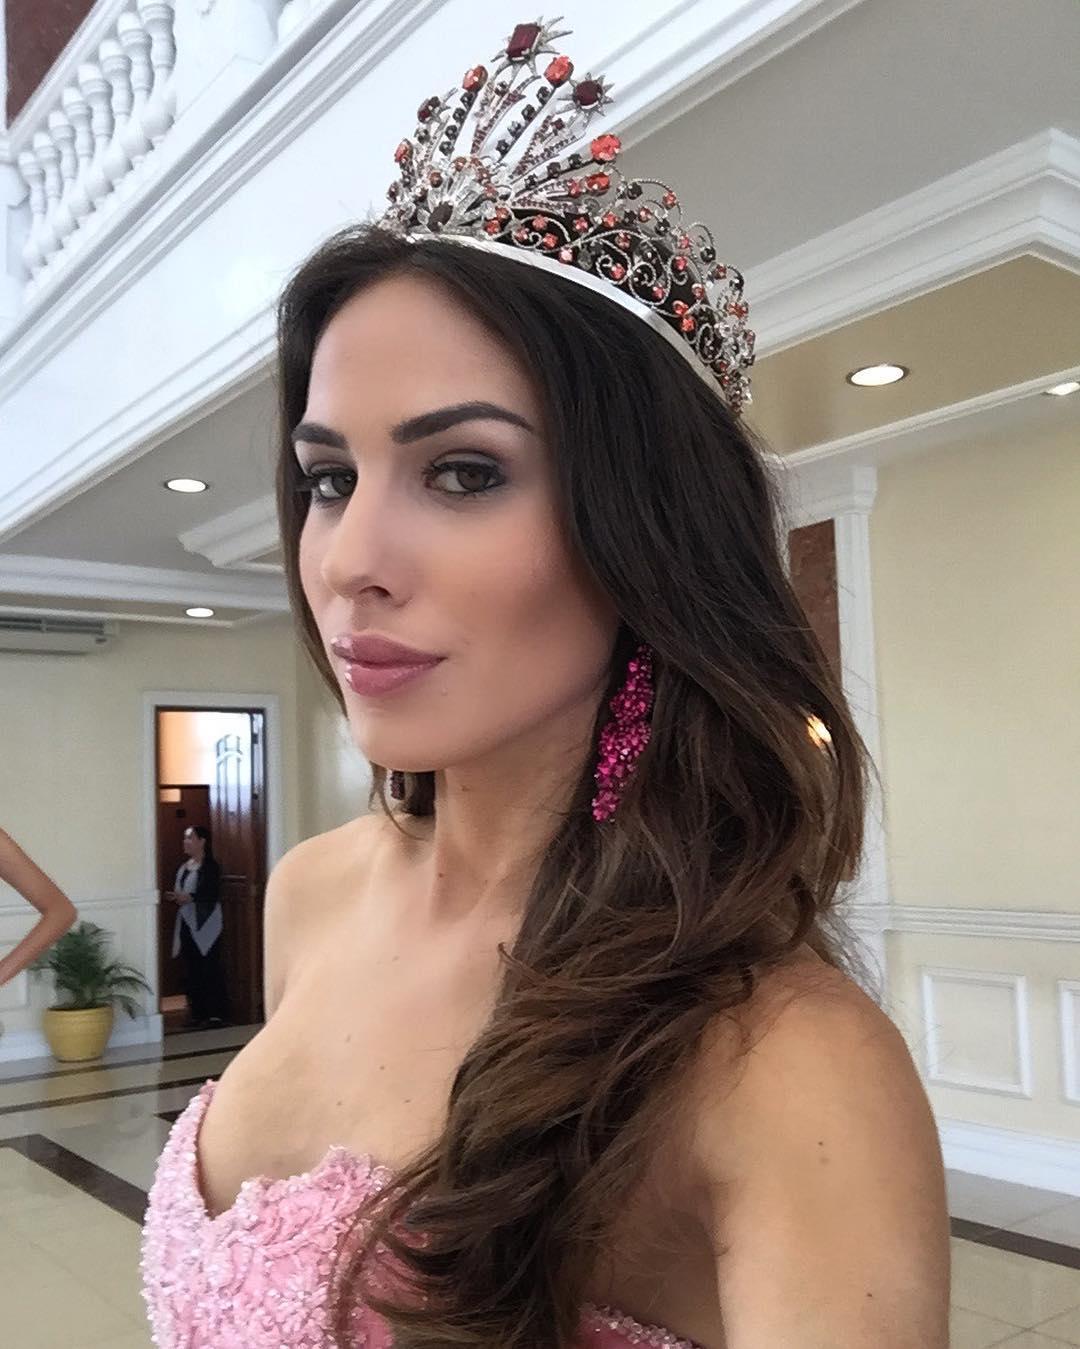 bruna zanardo, 1st runner-up de miss supranational brazil 2020/miss brasil internacional 2017/miss brasil terra 2016. - Página 6 At6rtj3w